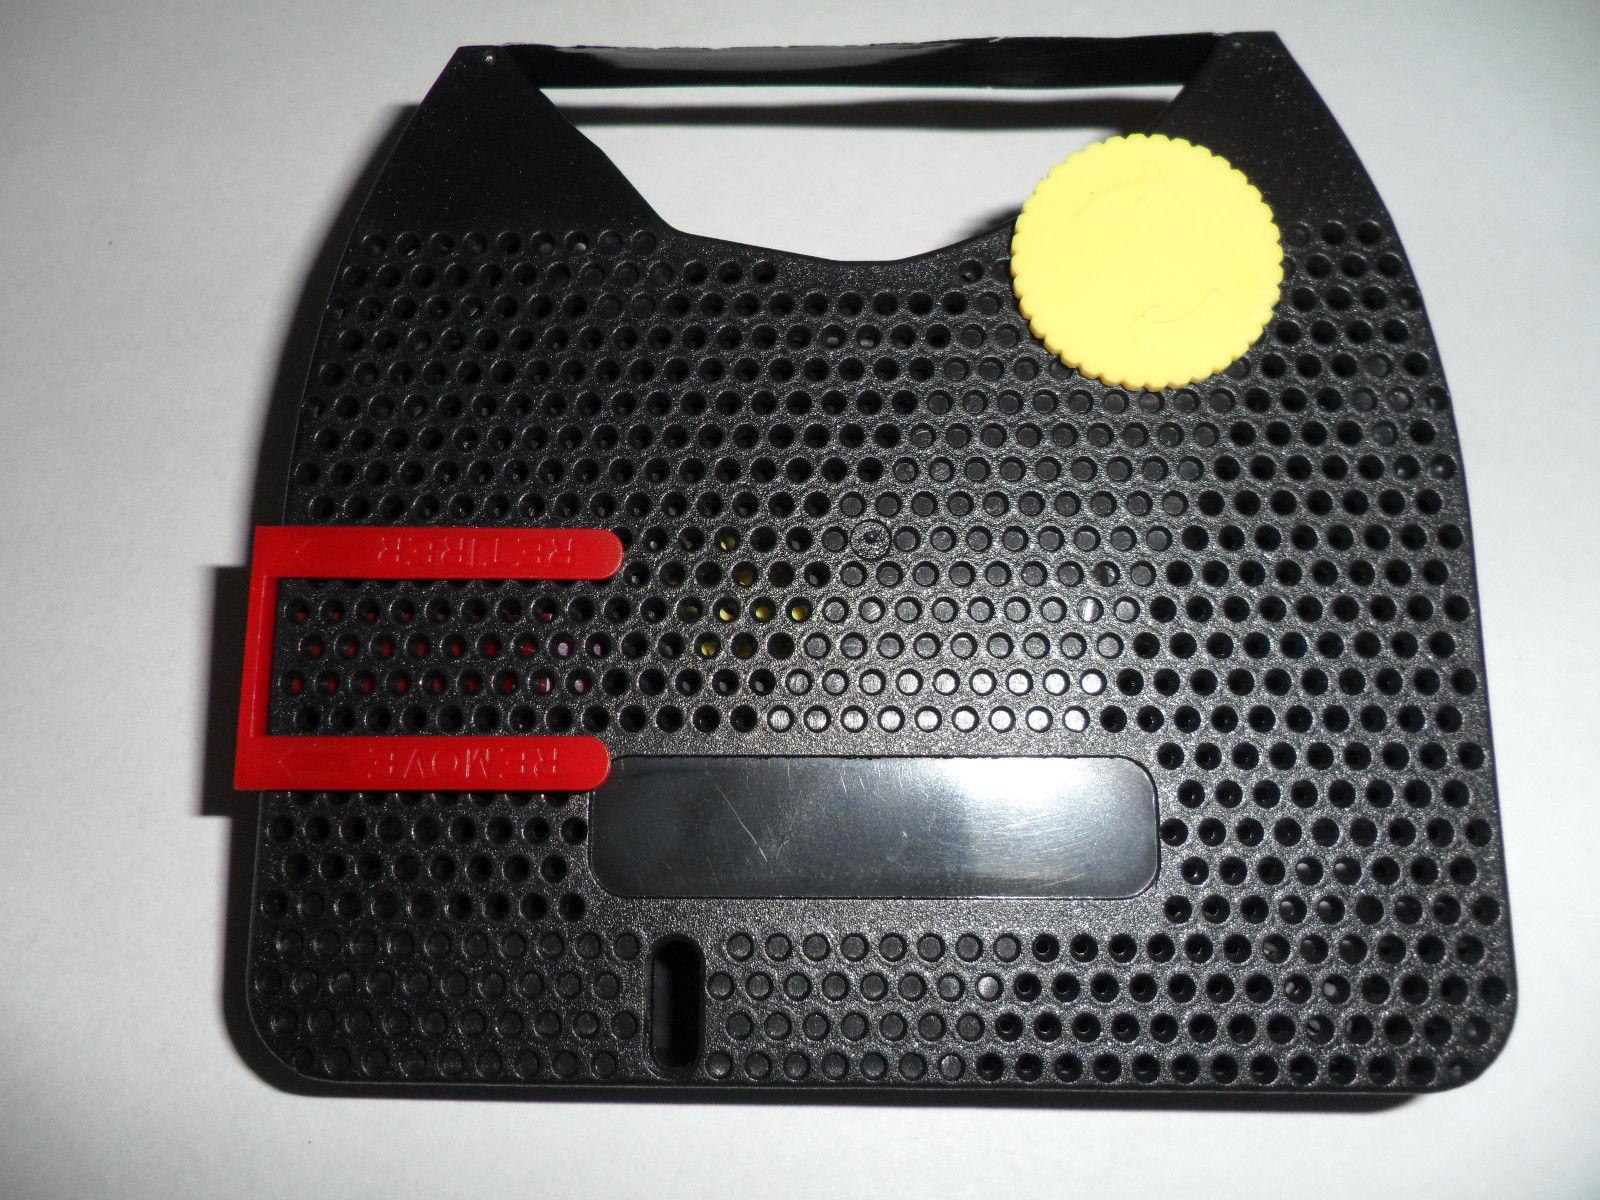 Smith Corona Mark XXI Mark XXII Typewriter Ribbon (2 Pack) Replaces 21000